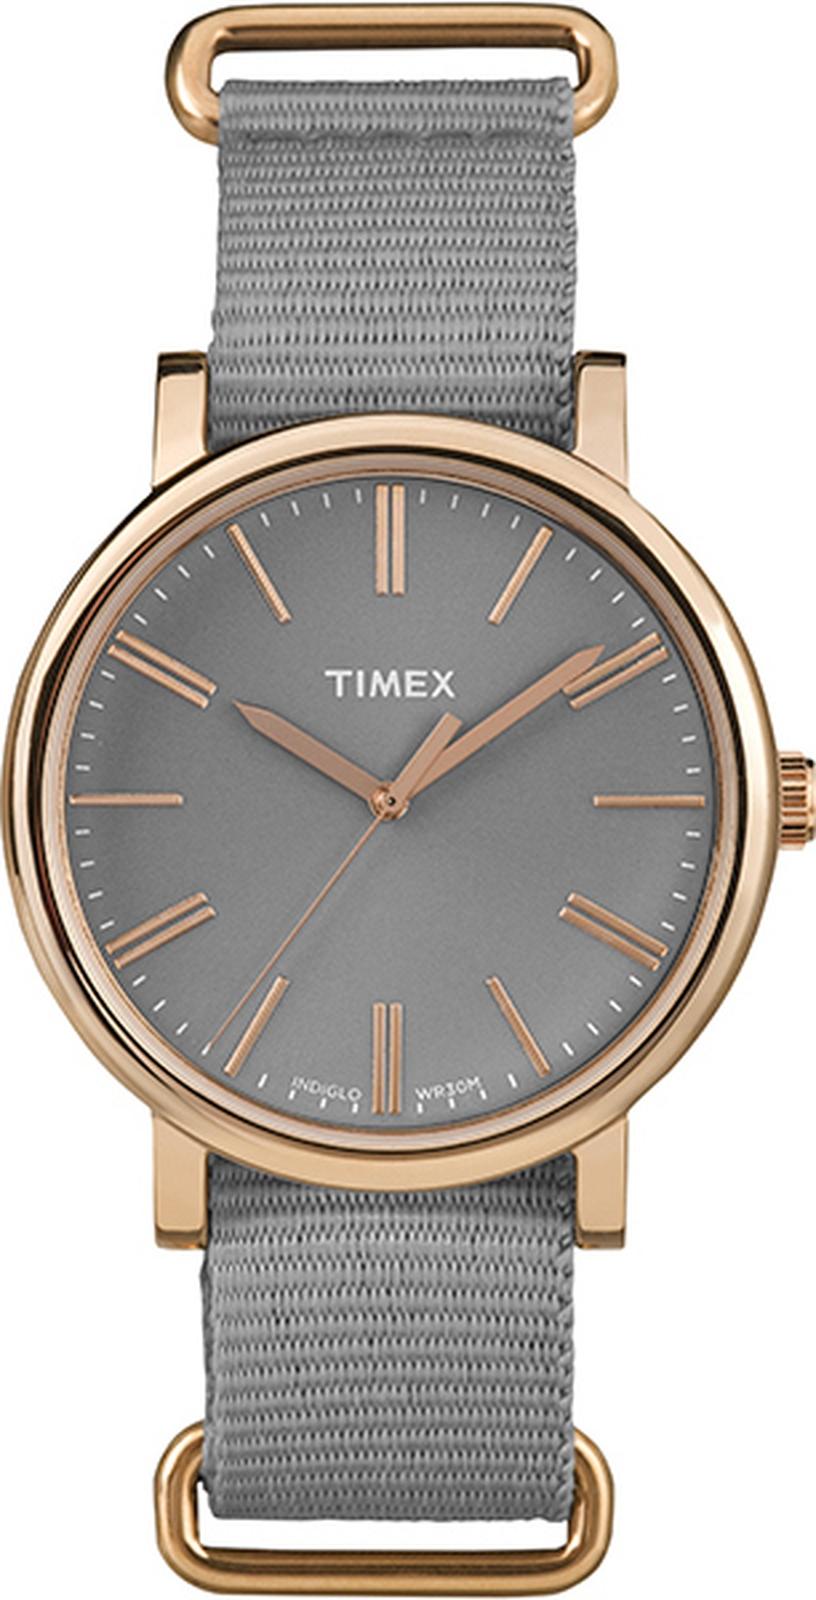 Часы Timex женские серый все цены